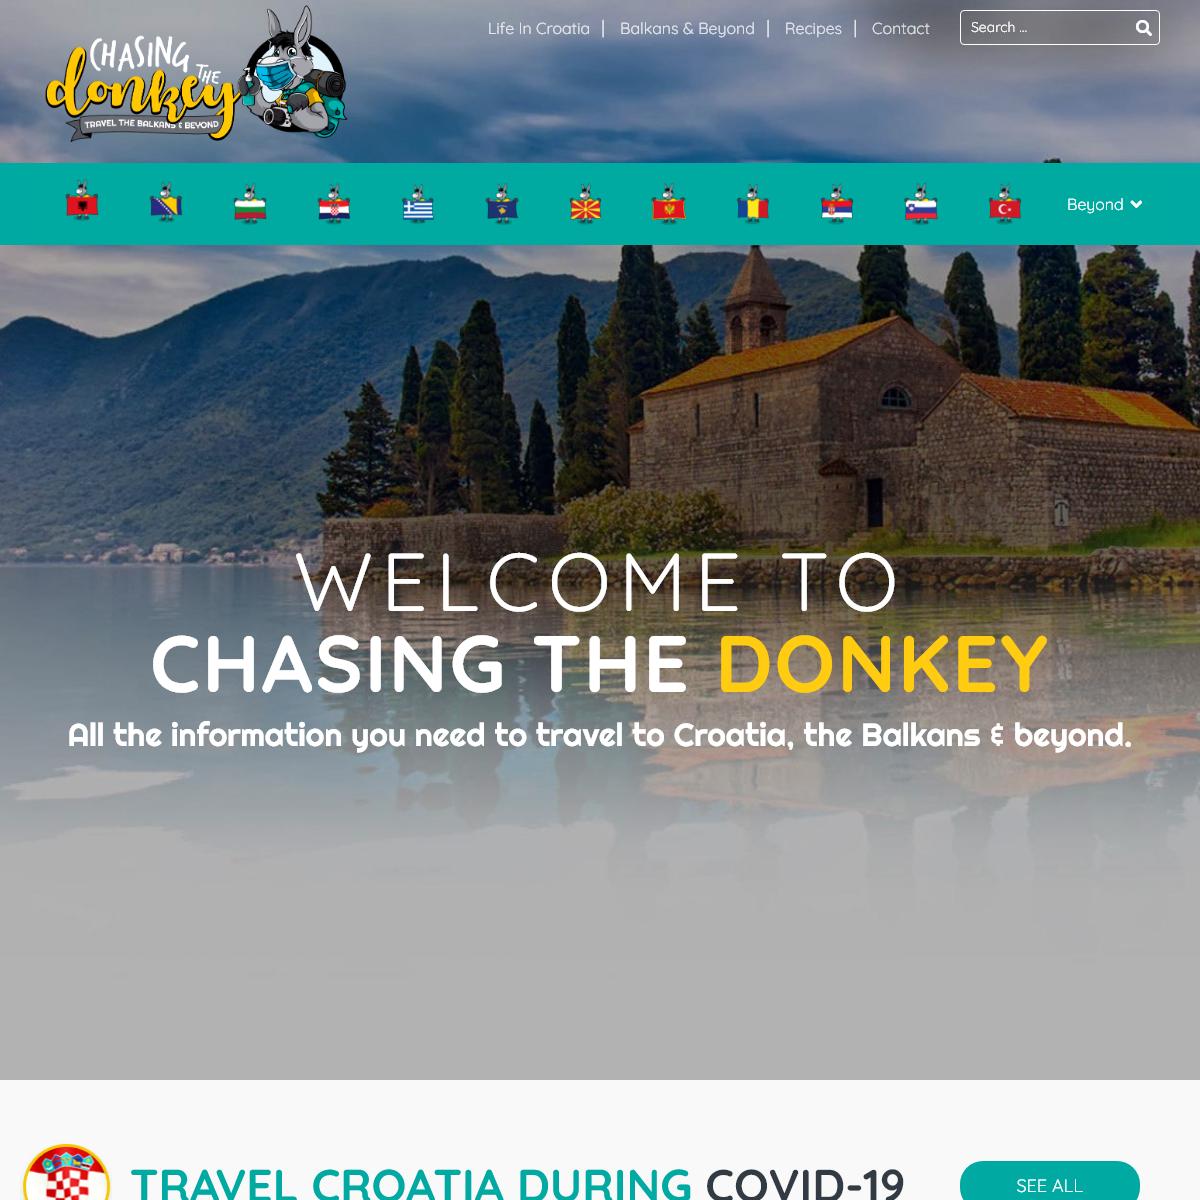 Chasing the Donkey Travel Blog - Balkans & Beyond